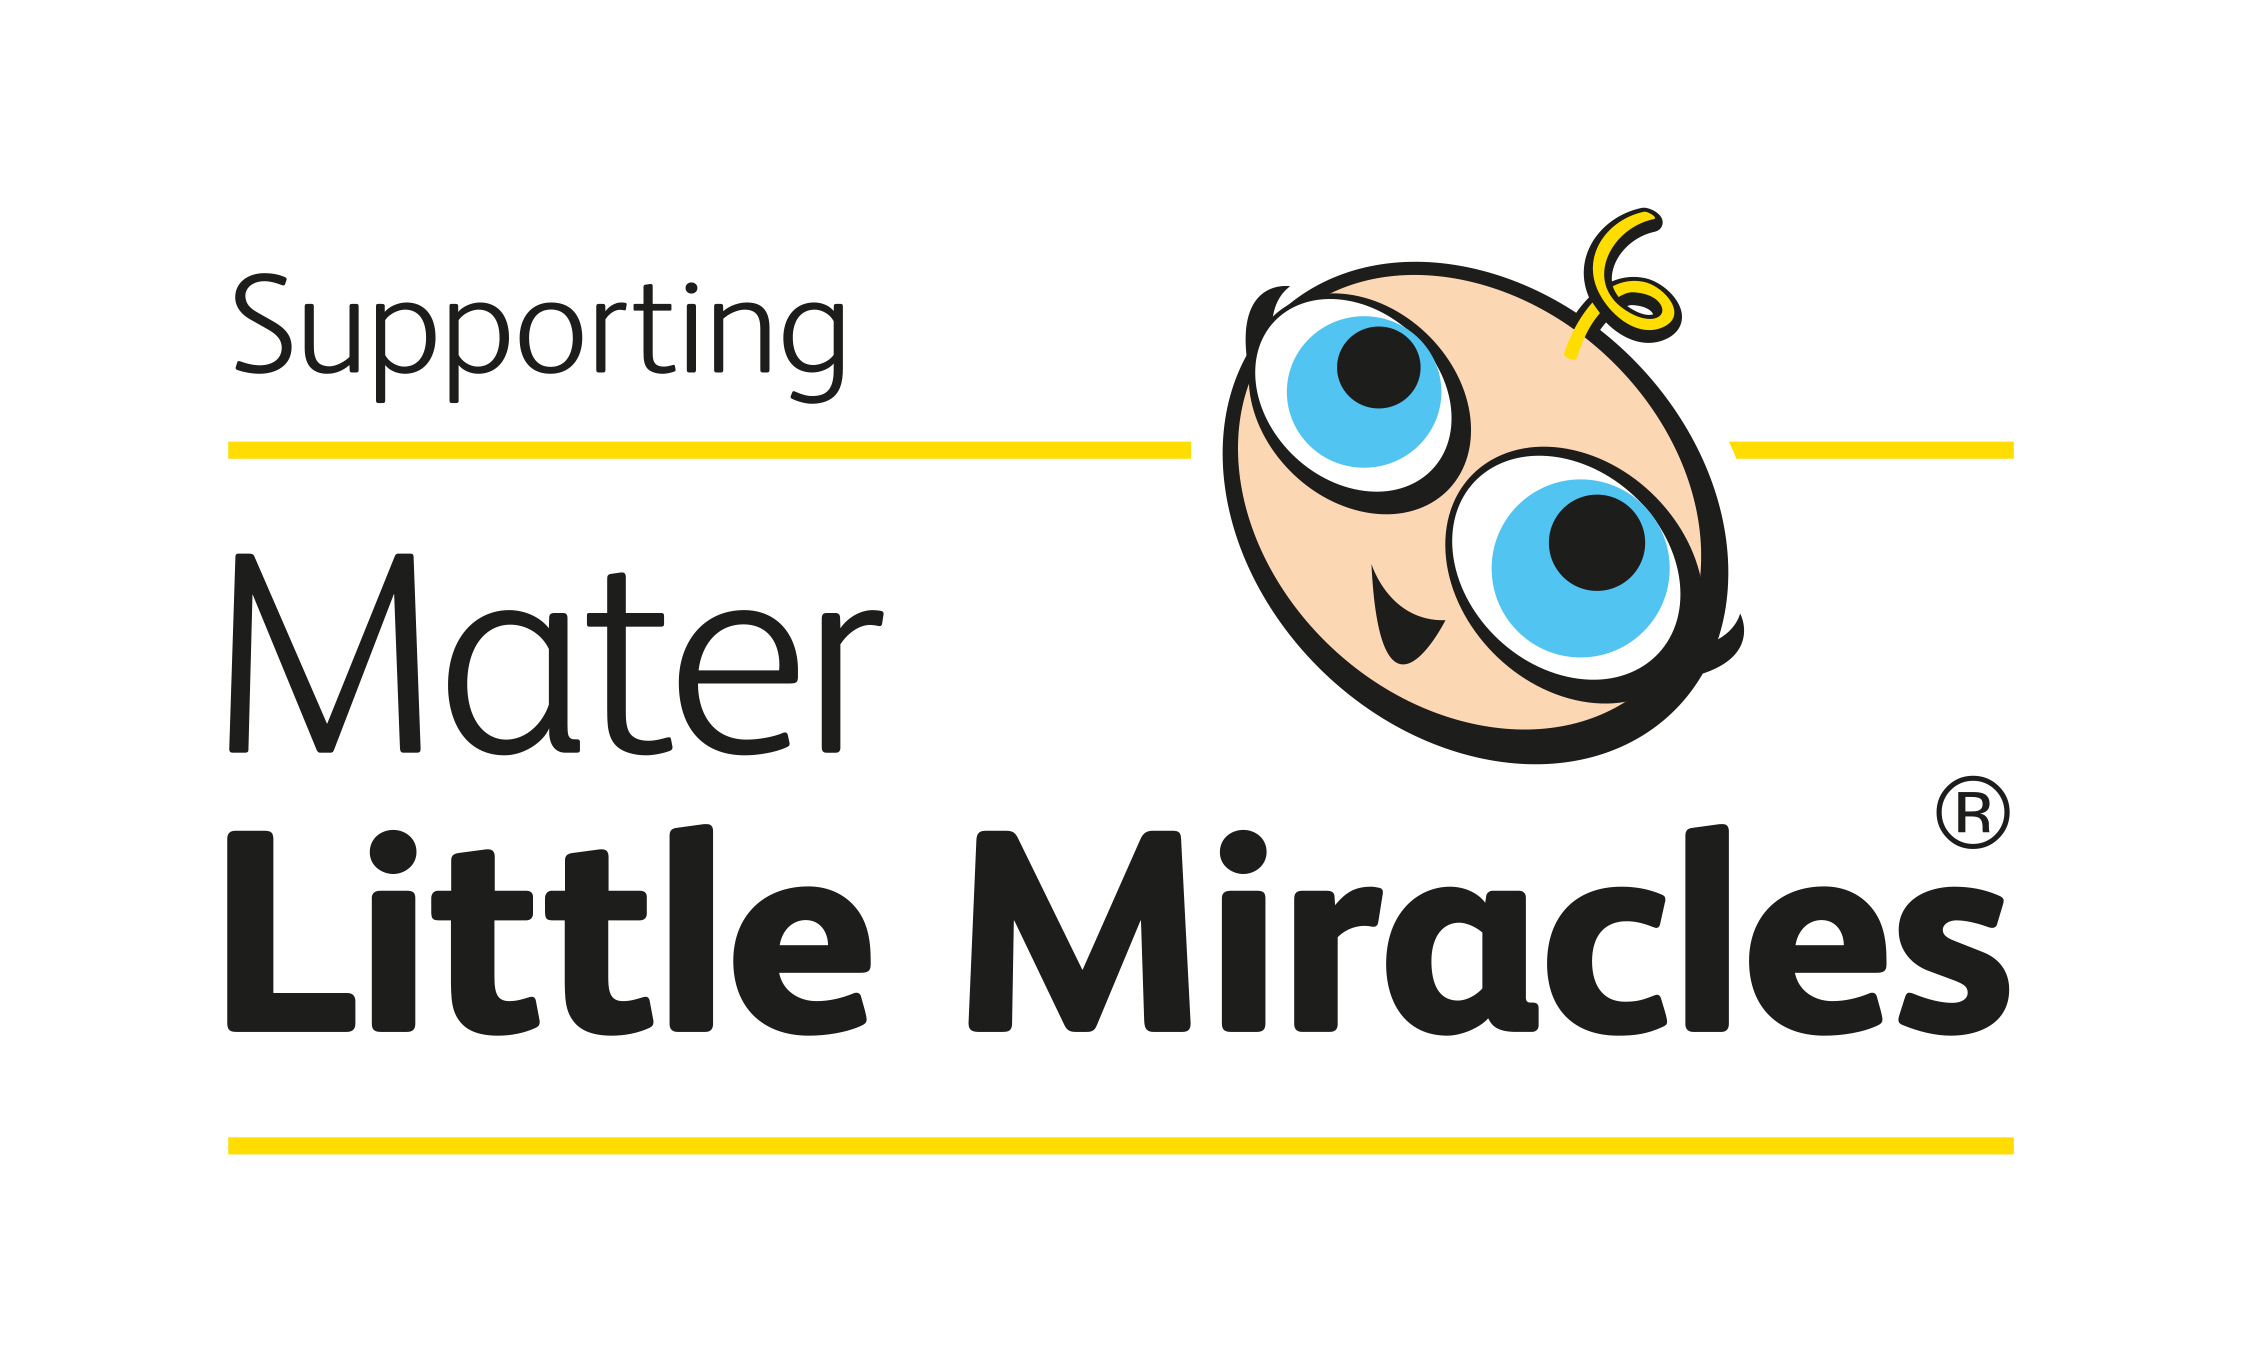 http://www.materlittlemiracles.org.au/